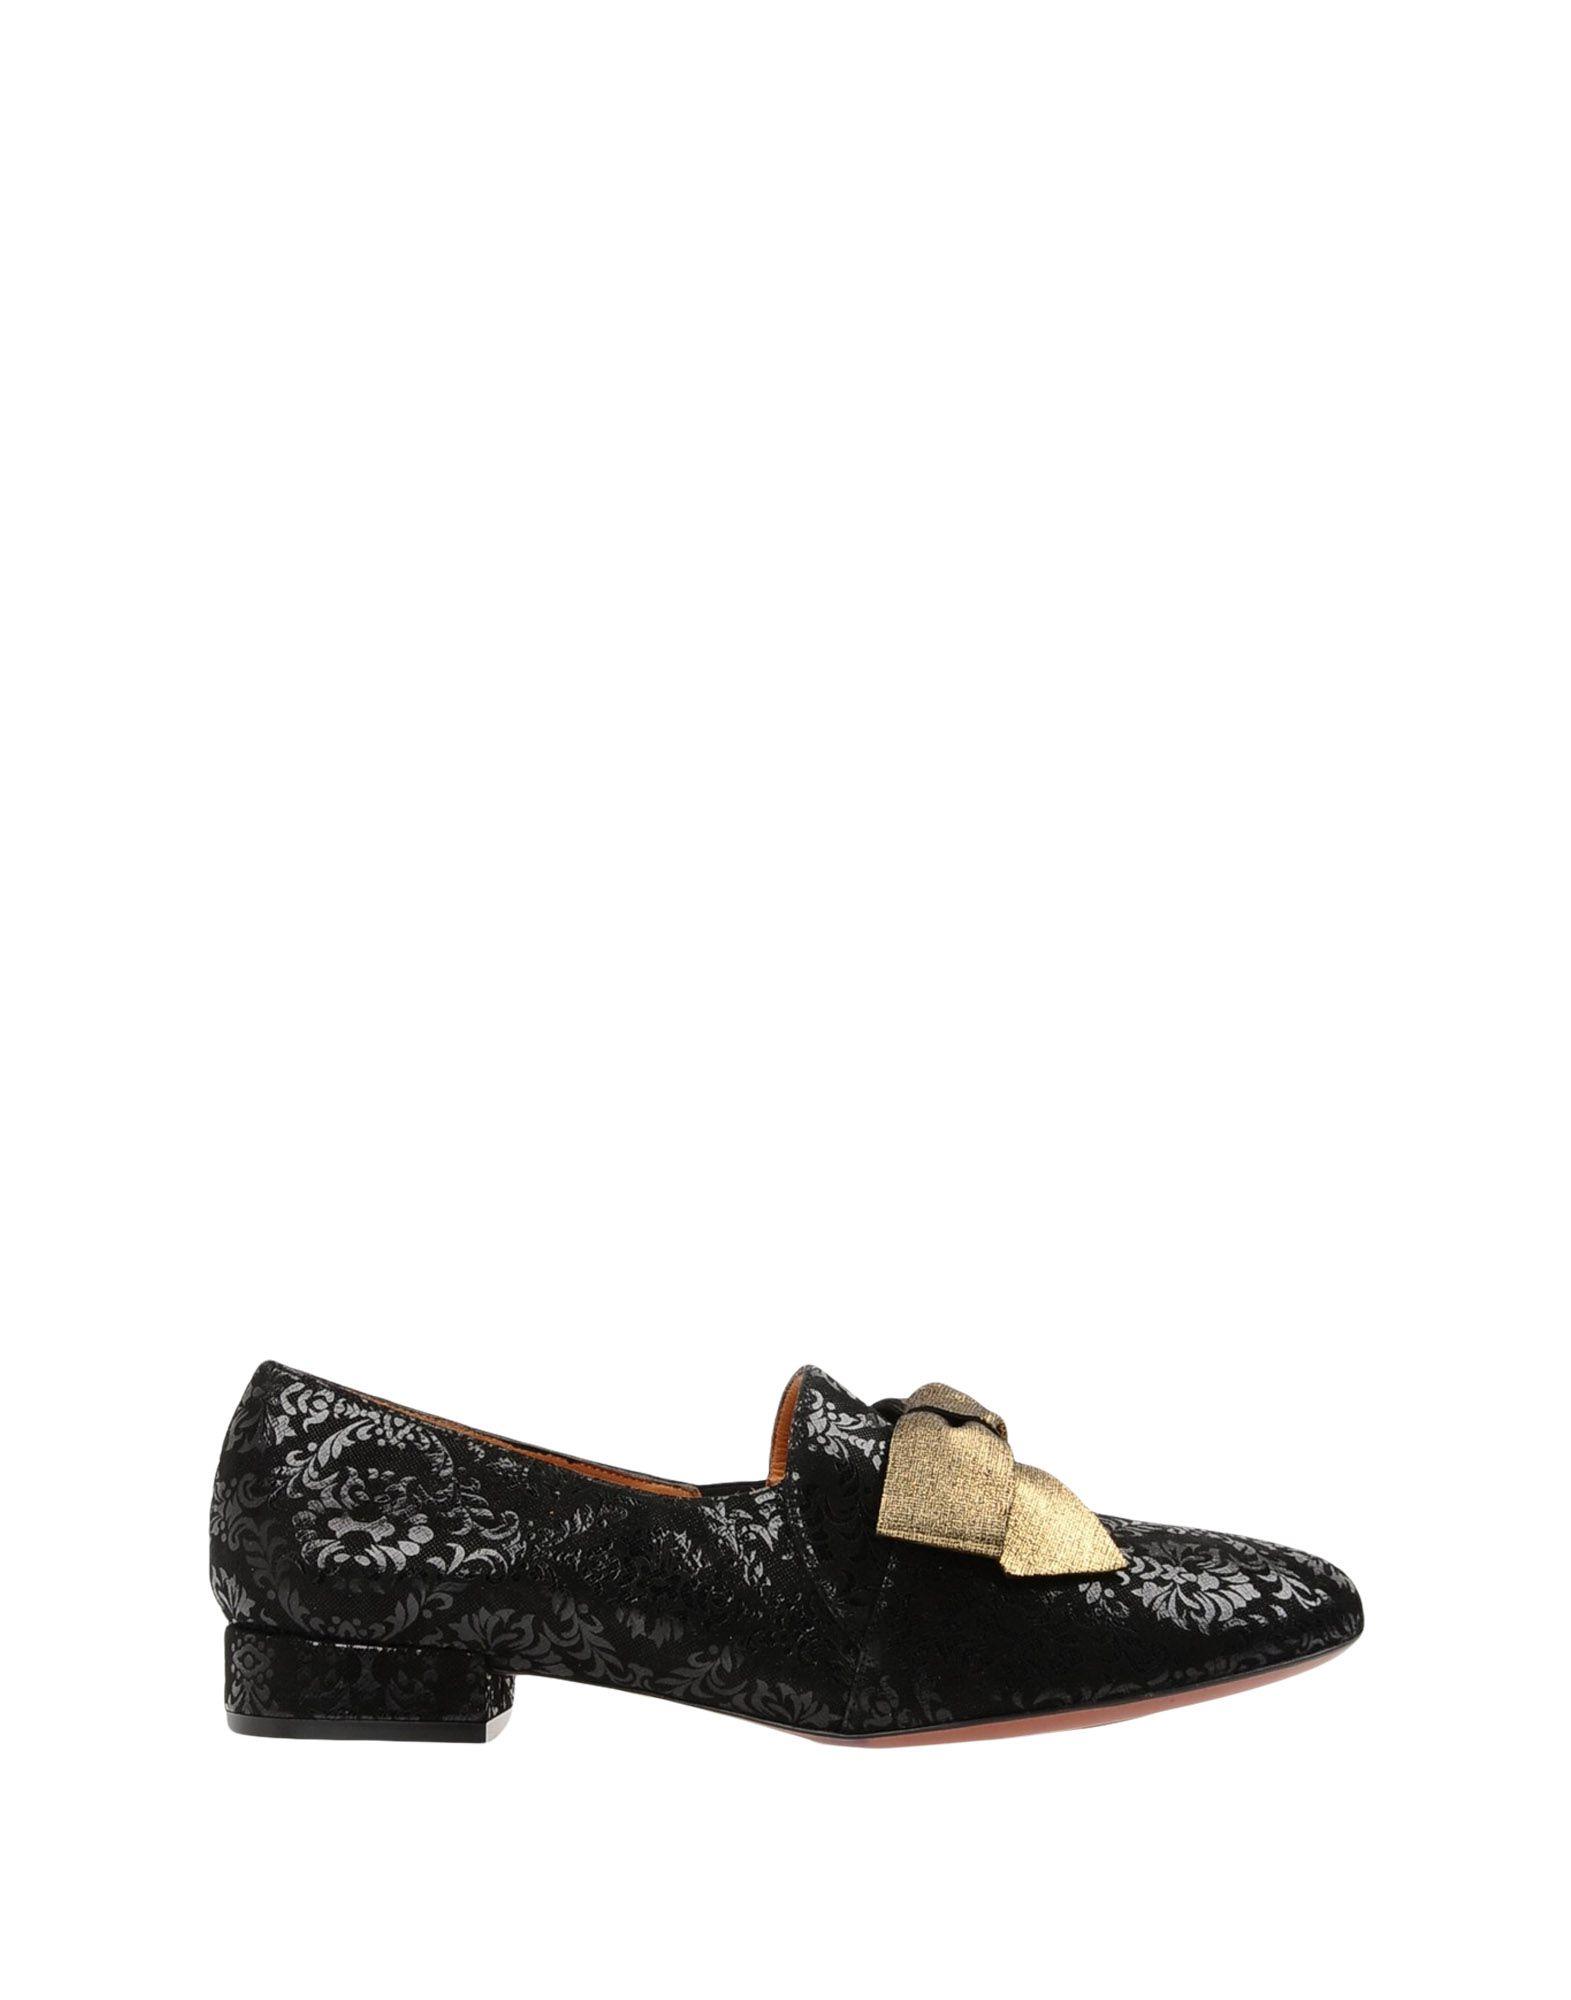 Rabatt Schuhe Chie Mihara Mokassins 11350477RX Damen  11350477RX Mokassins 5b1998